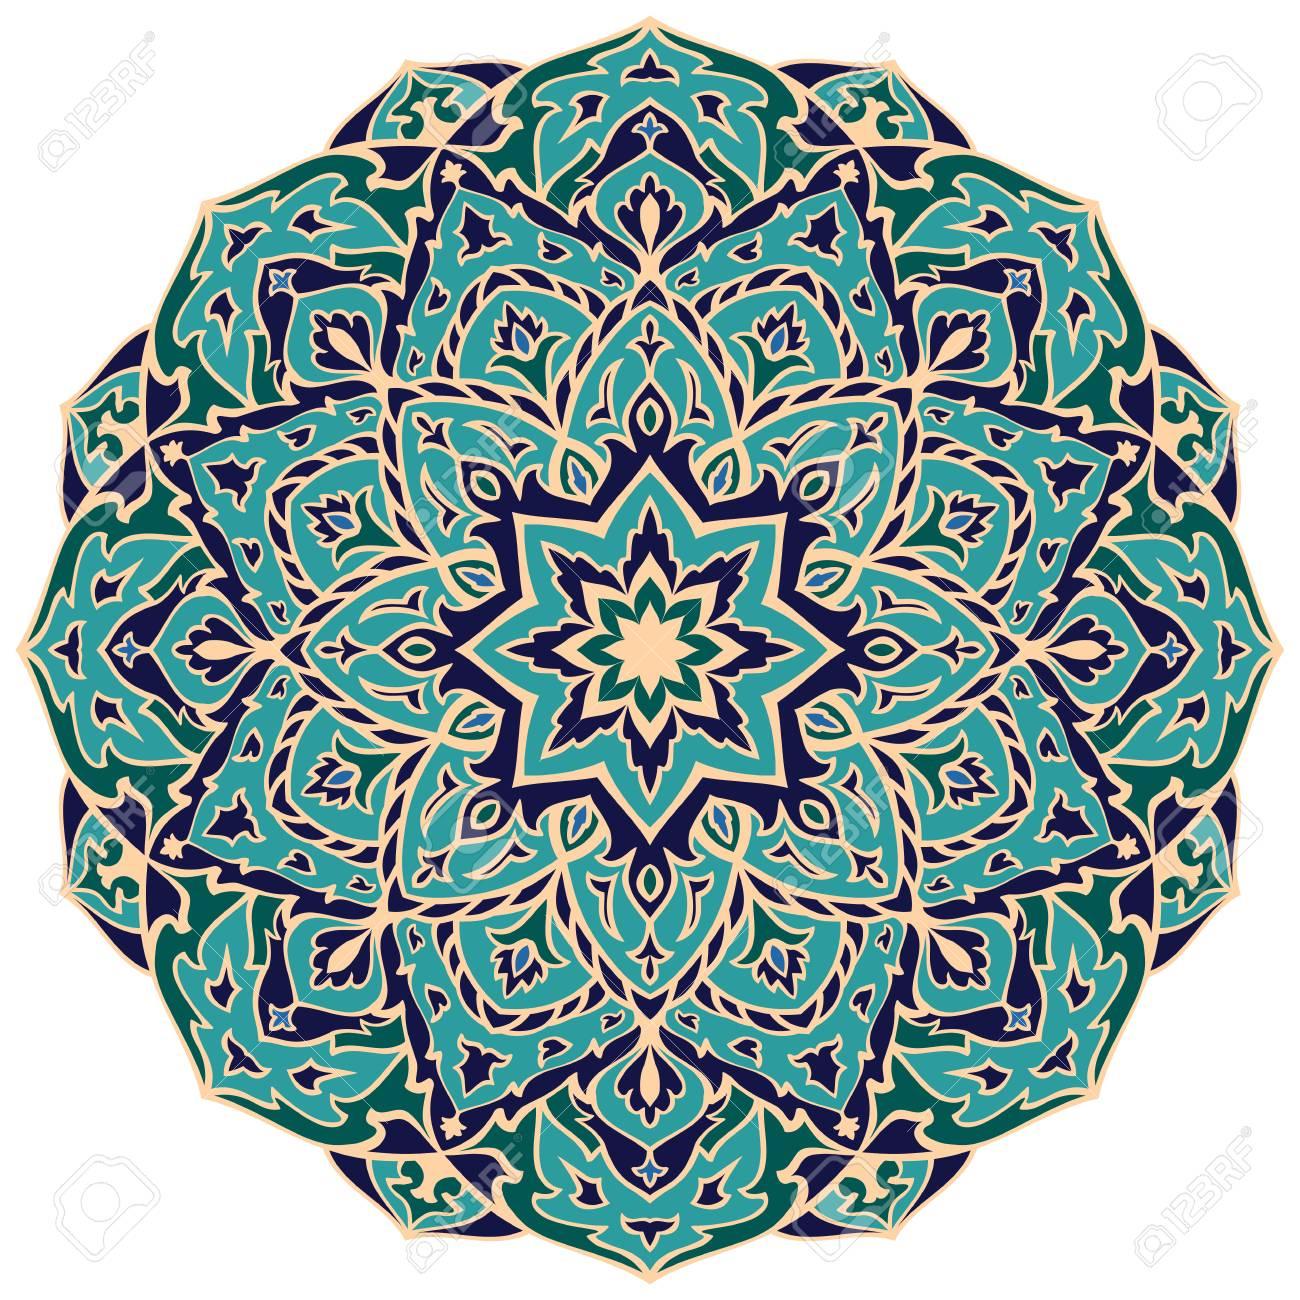 Bunte Mandala Des Ostvektors Rundes Gestaltungselement Fur Teppiche